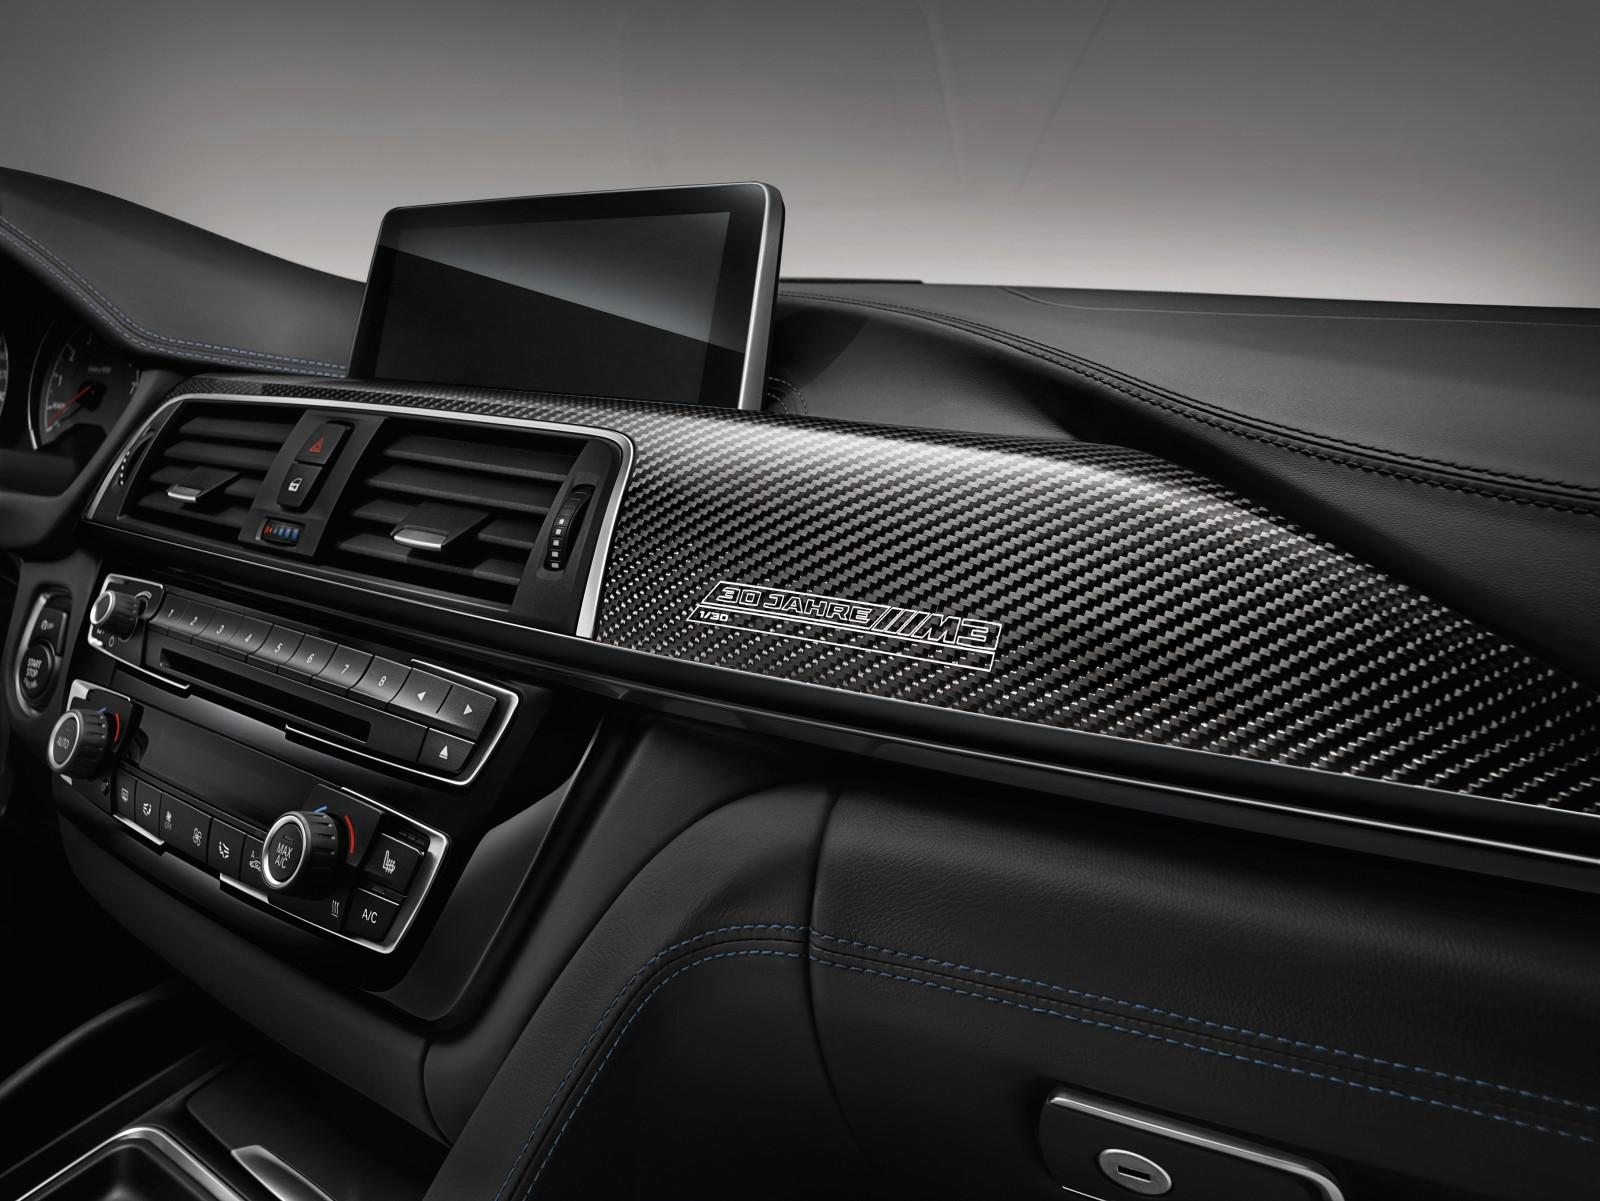 BMW M3 30 Jahre Limited Edition (8)